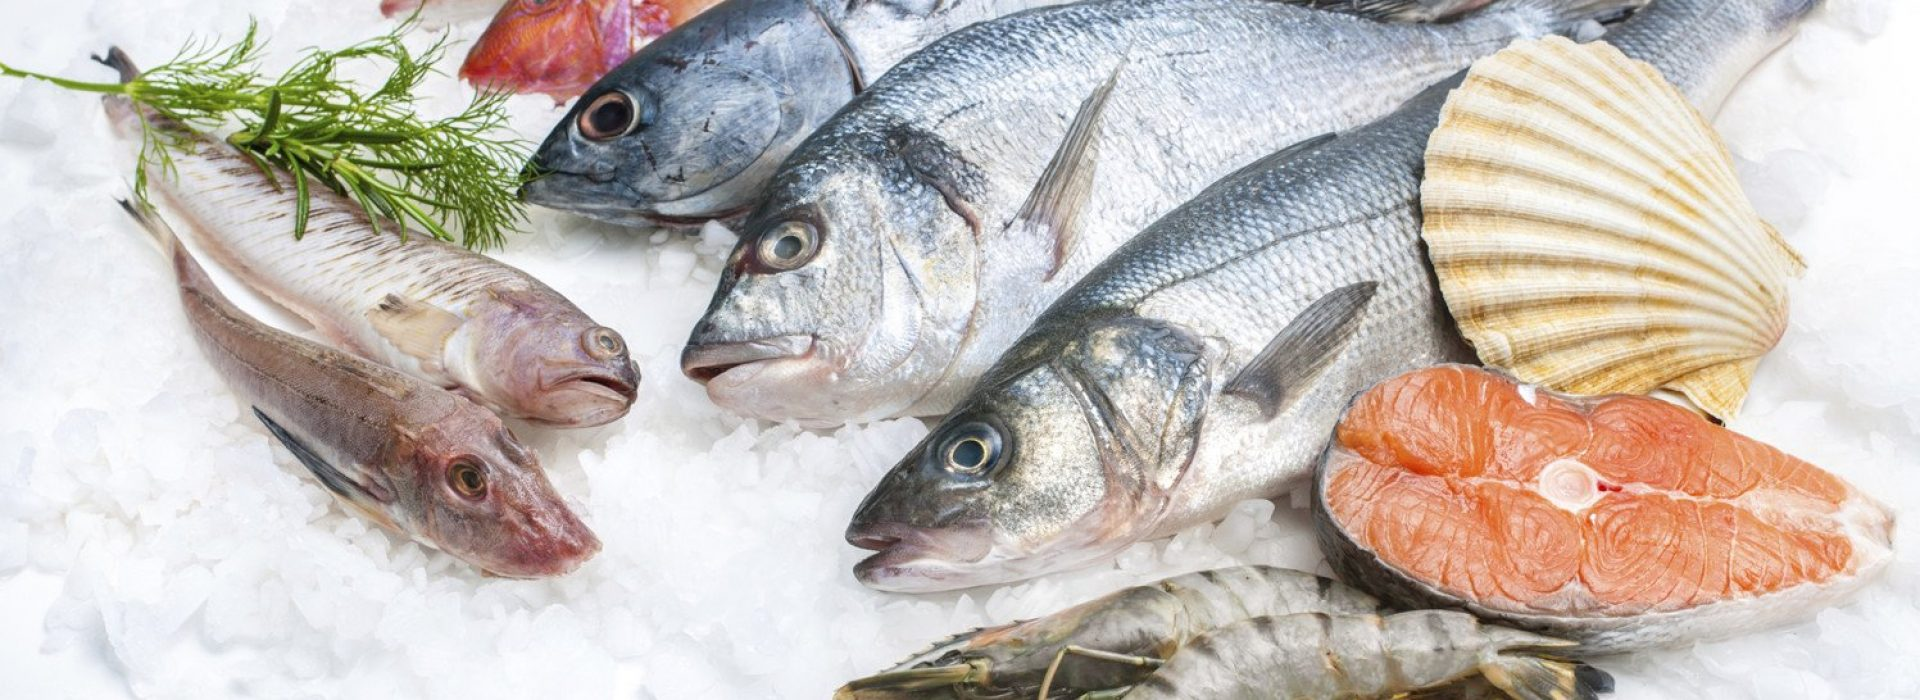 pescado-omega3